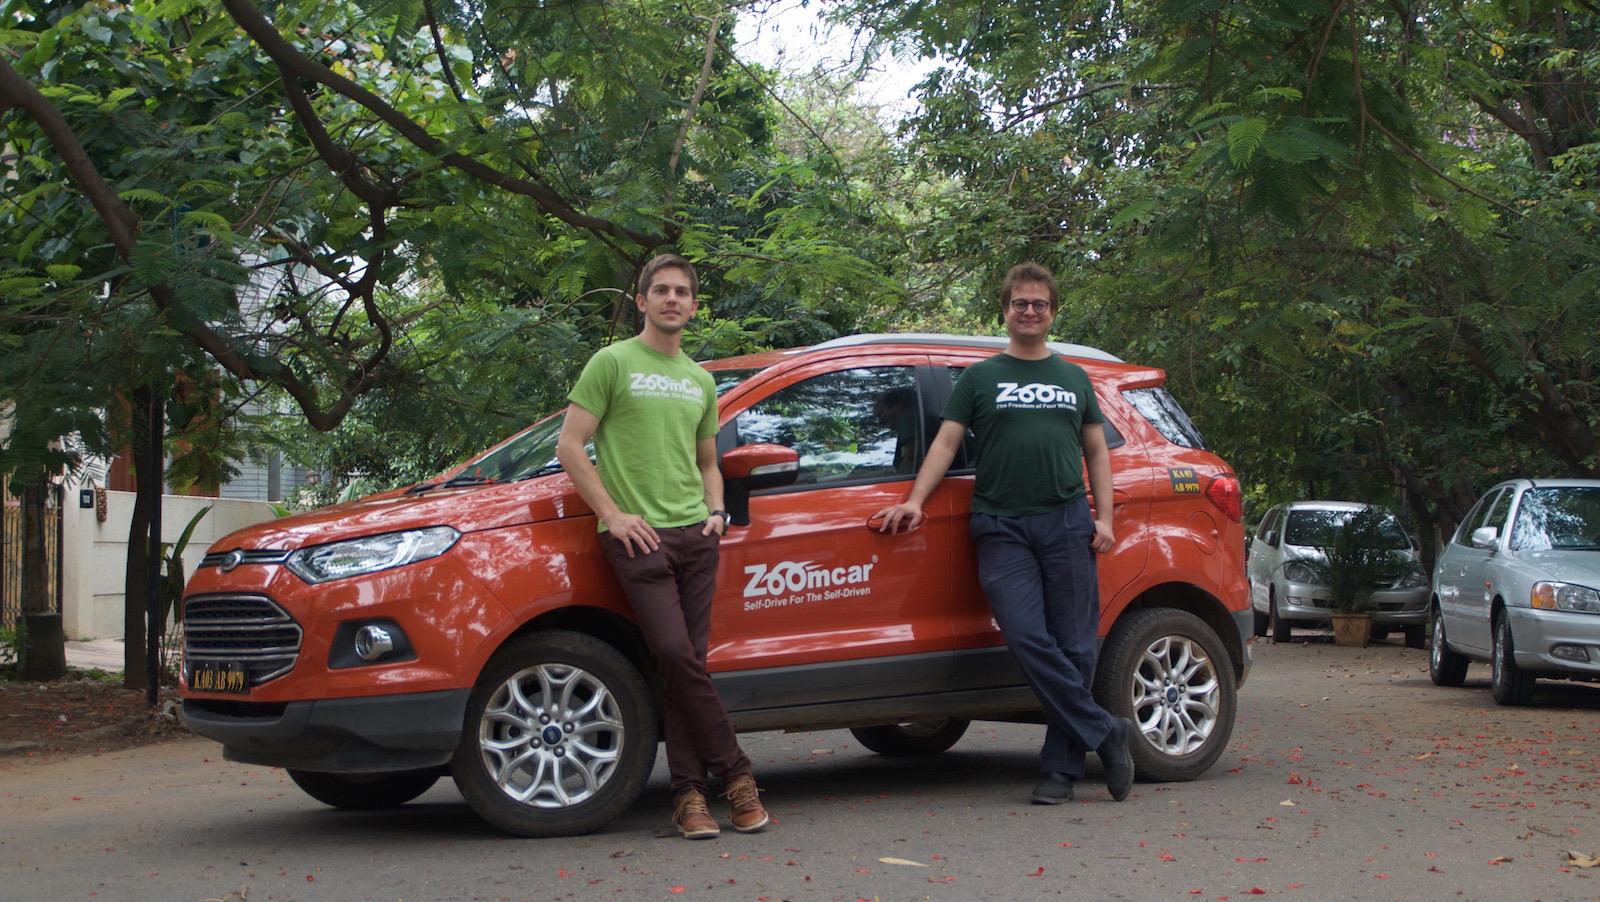 Zoomcar founders Greg Moran and David Back